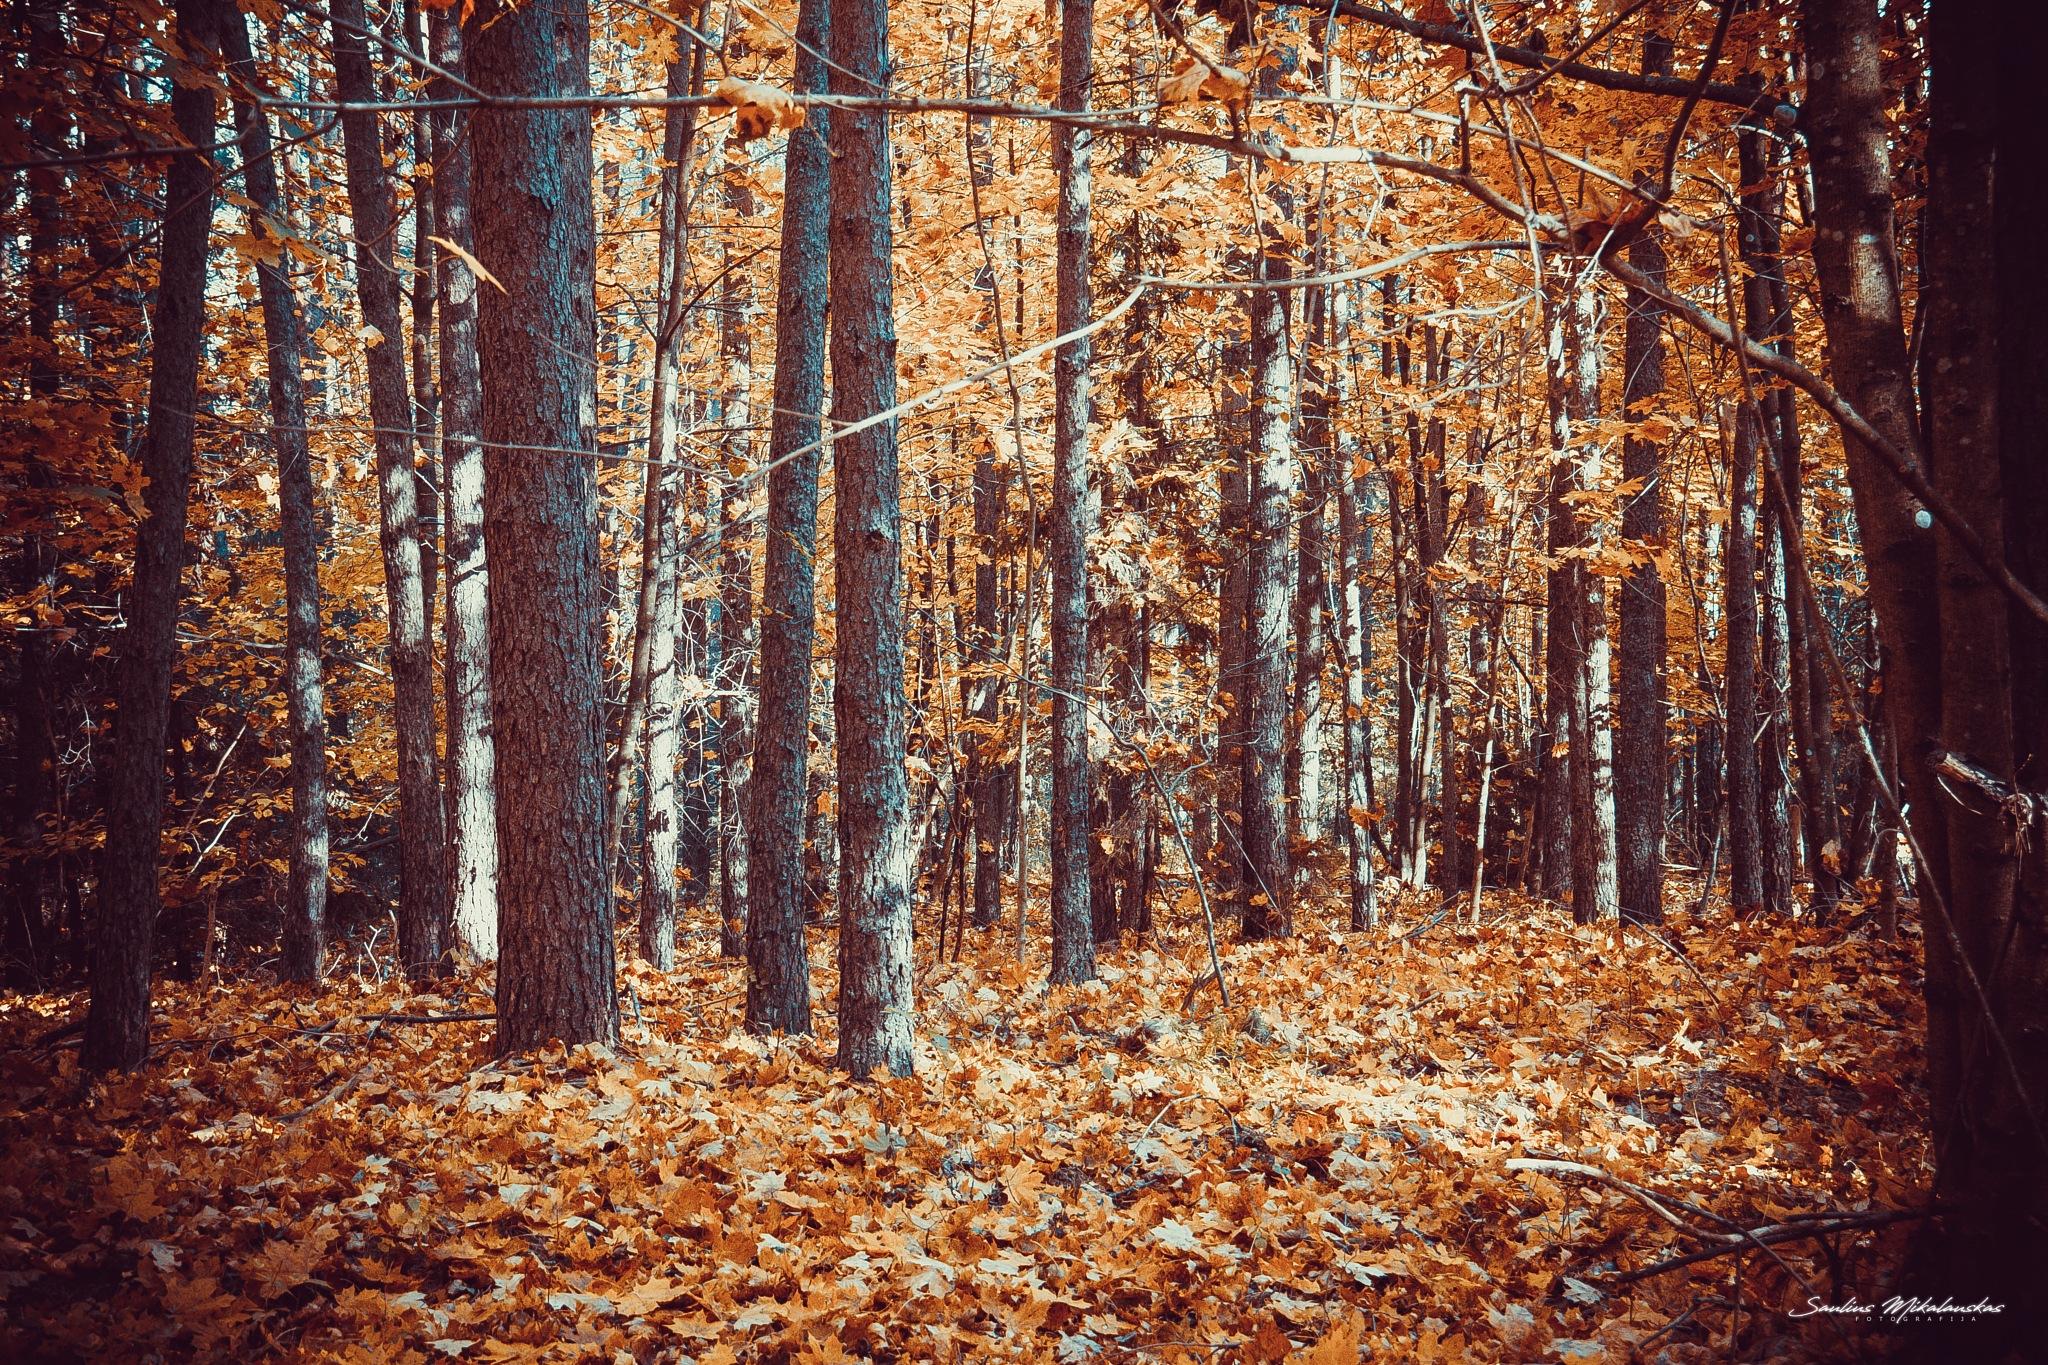 Autumn forest by Saulius Mikalauskas